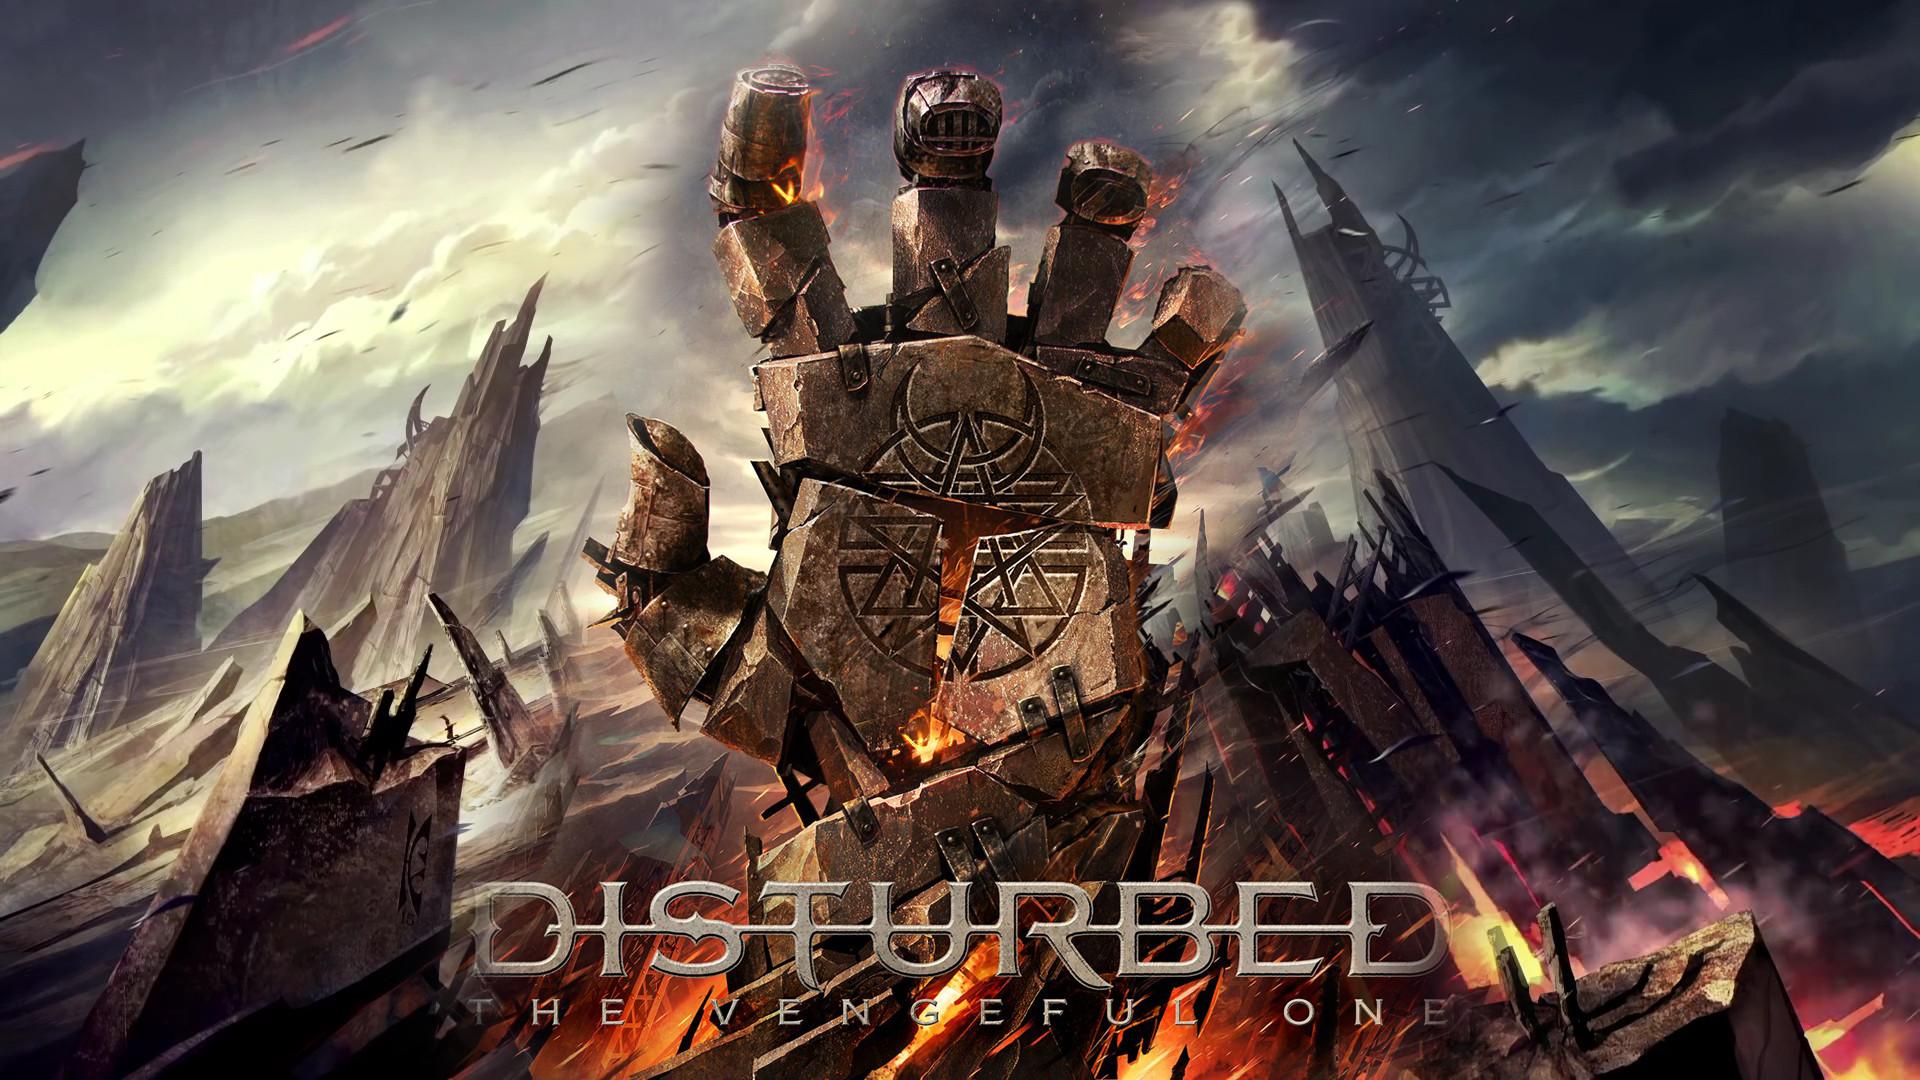 … DISTURBED – The Vengeful One [WALLPAPER] by disturbedkorea